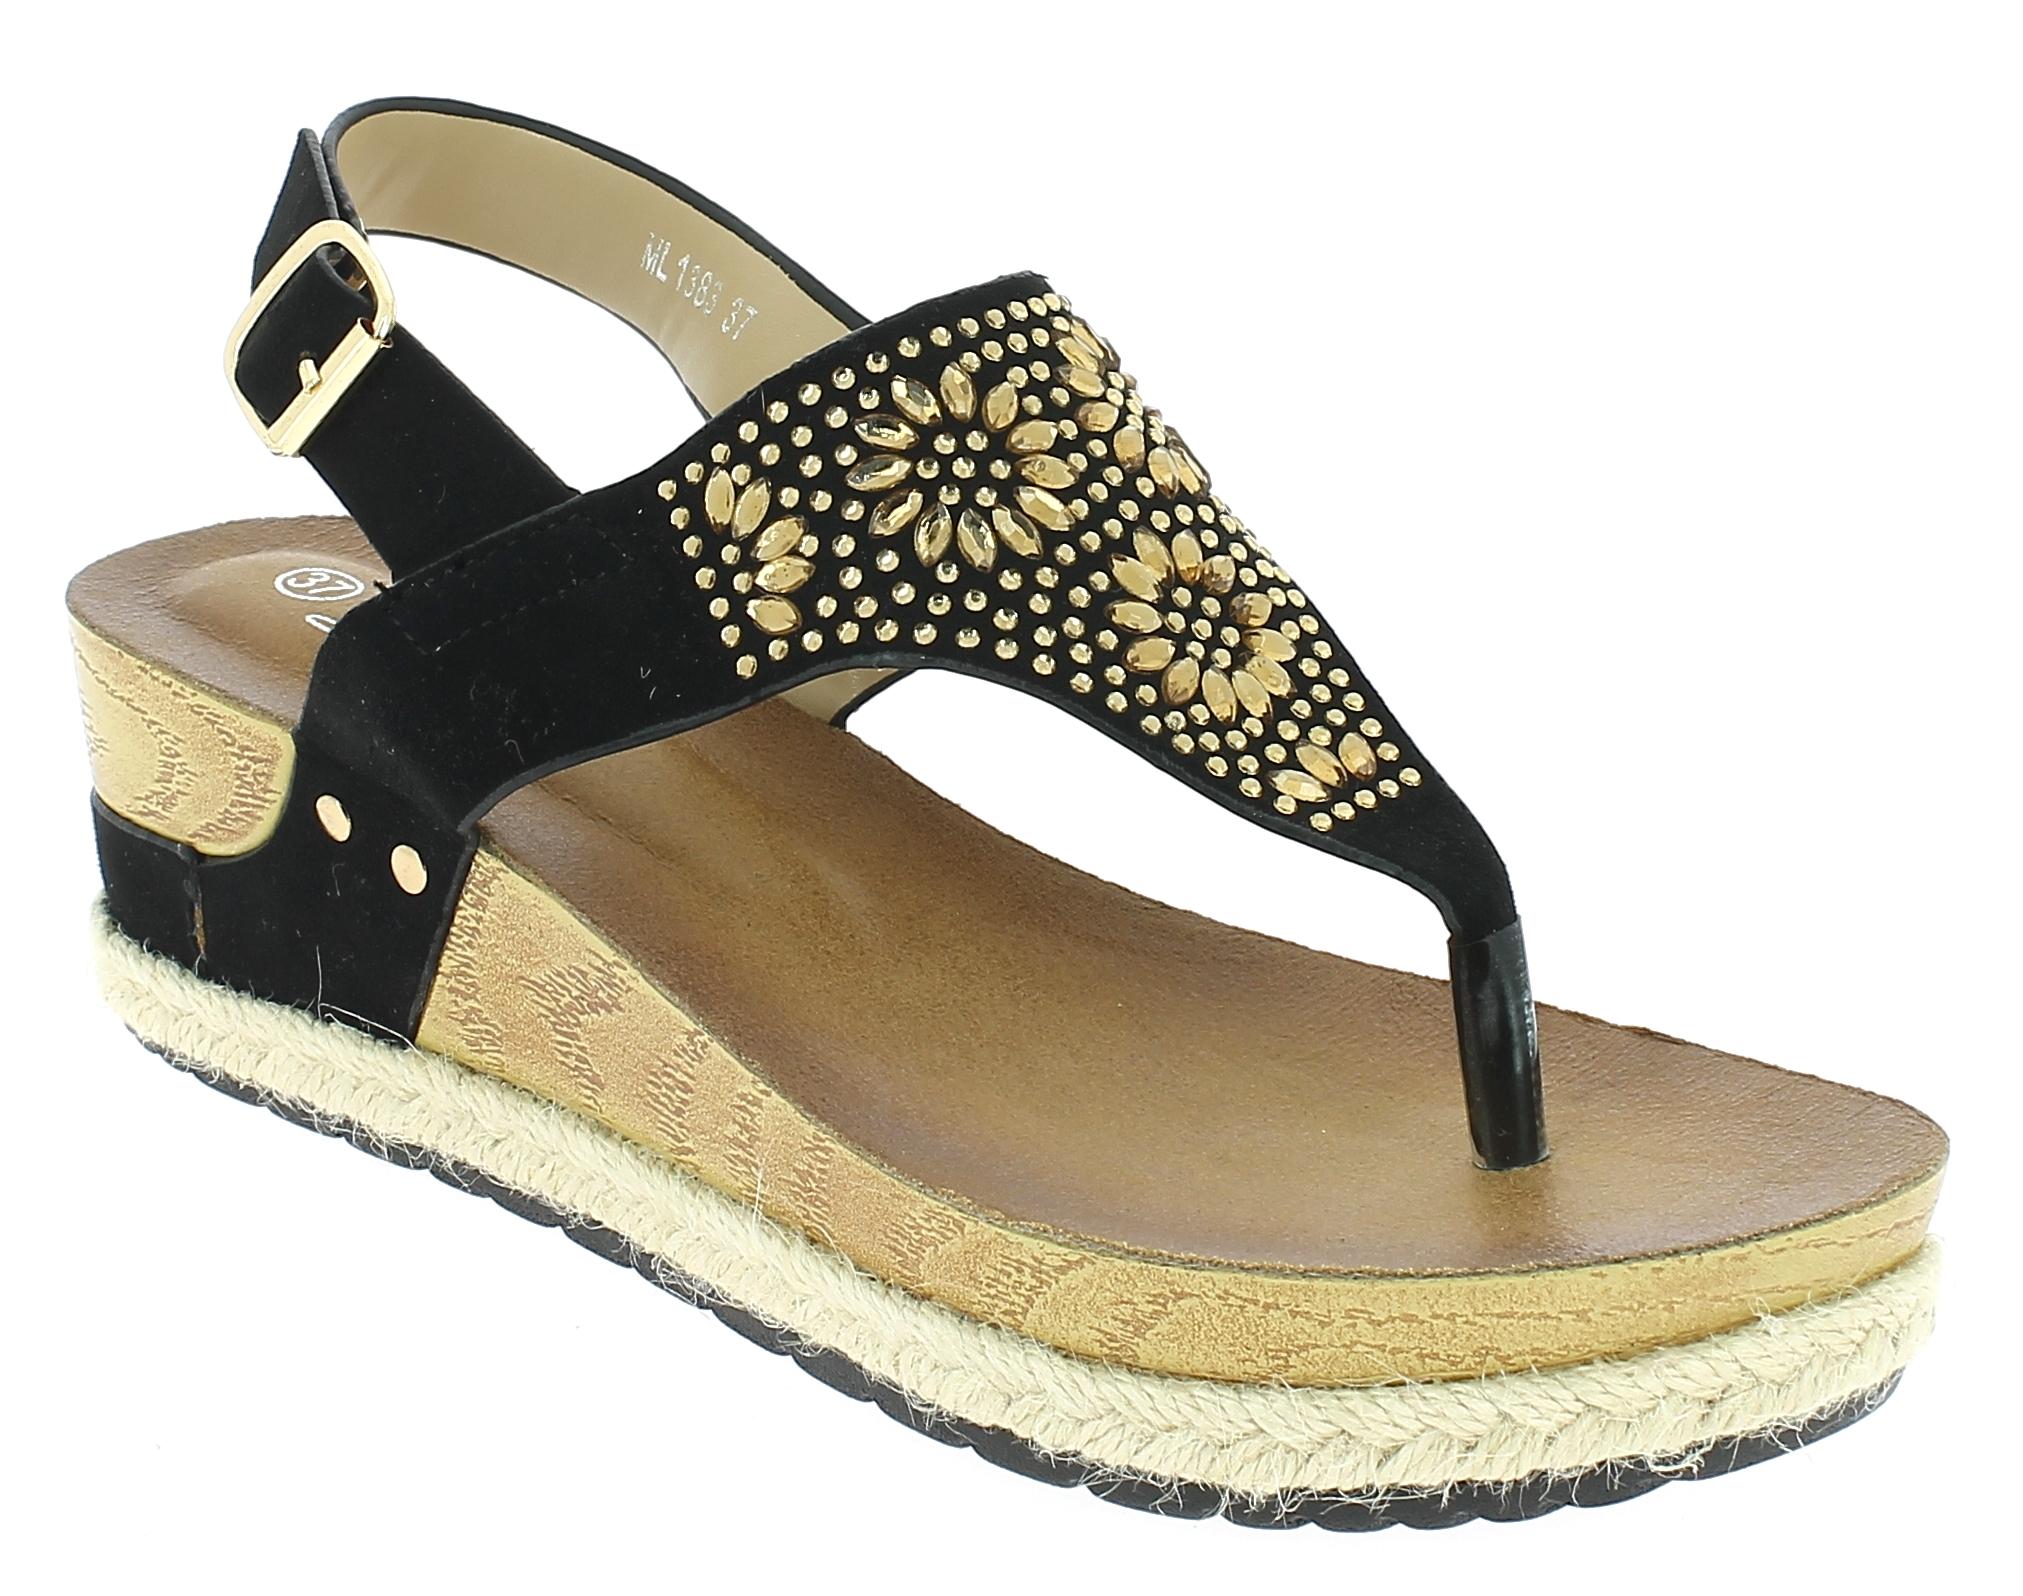 IQSHOES Γυναικεία Πλατφόρμα ML1383 Μαύρο - IqShoes - ML1383 BLACK-black-37/1/15/ παπούτσια  γυναικείες πλατφόρμες